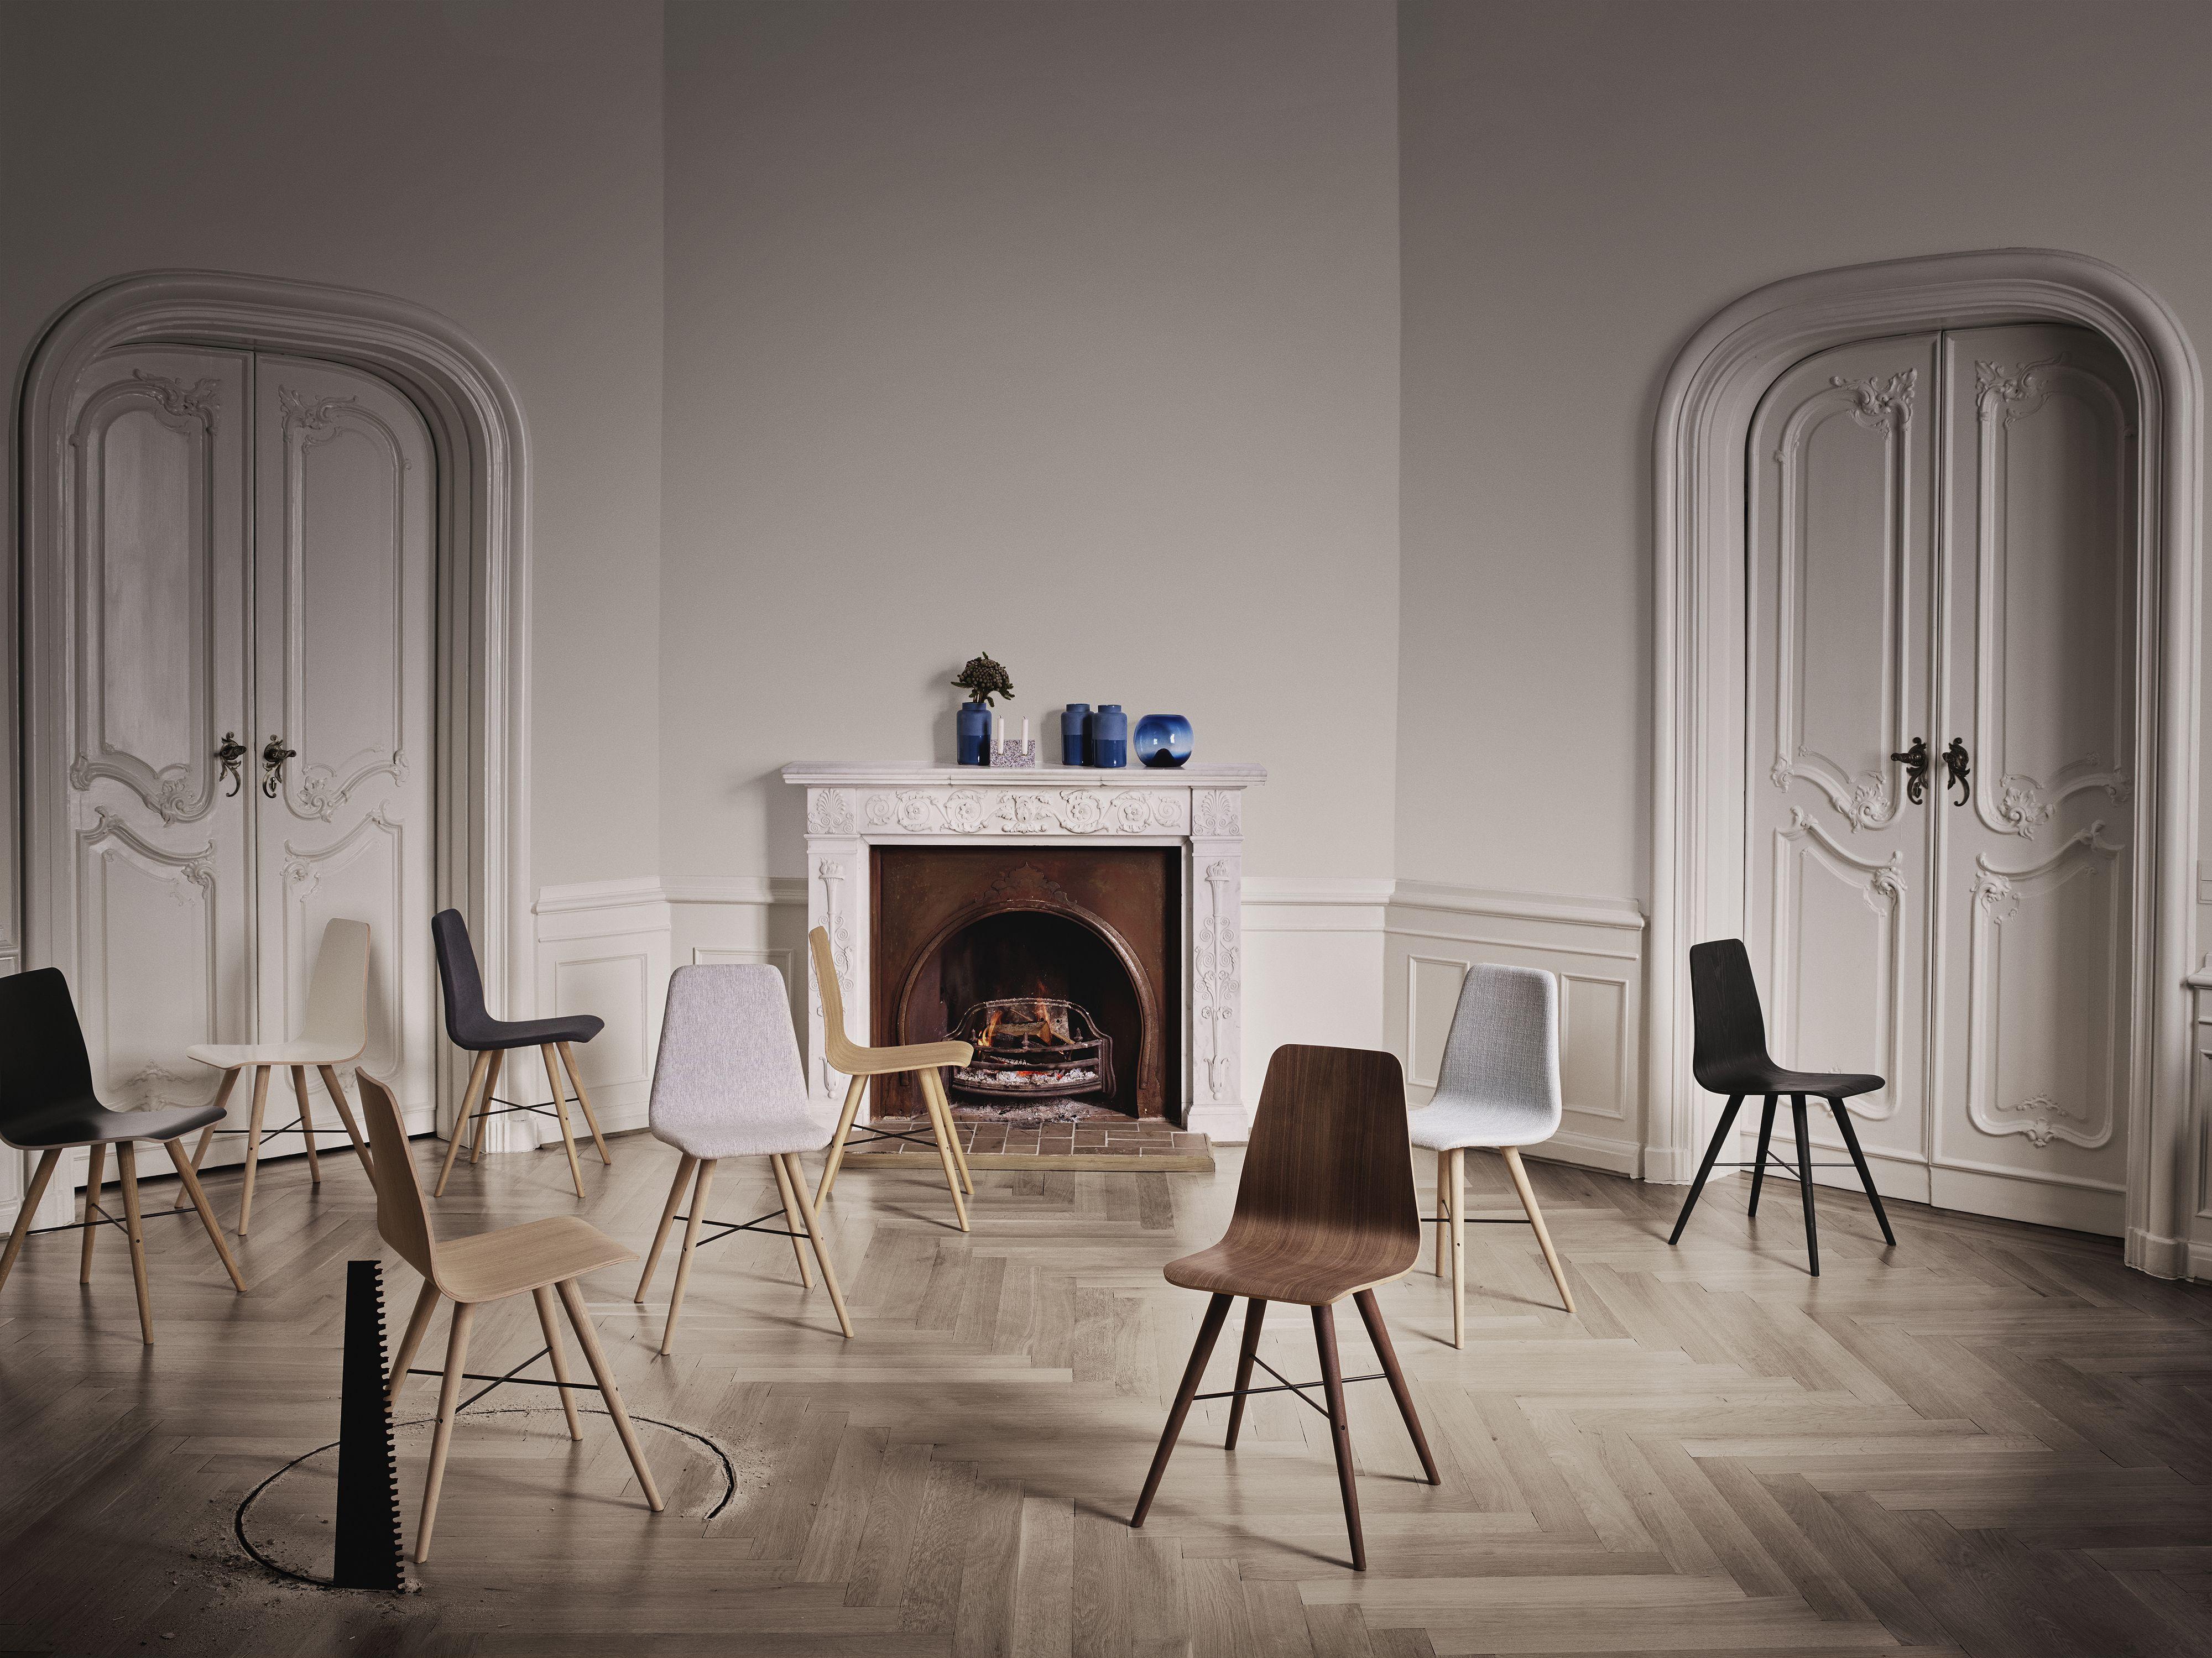 Modern wooden dining room image by Greta Matthiasdottir on ...